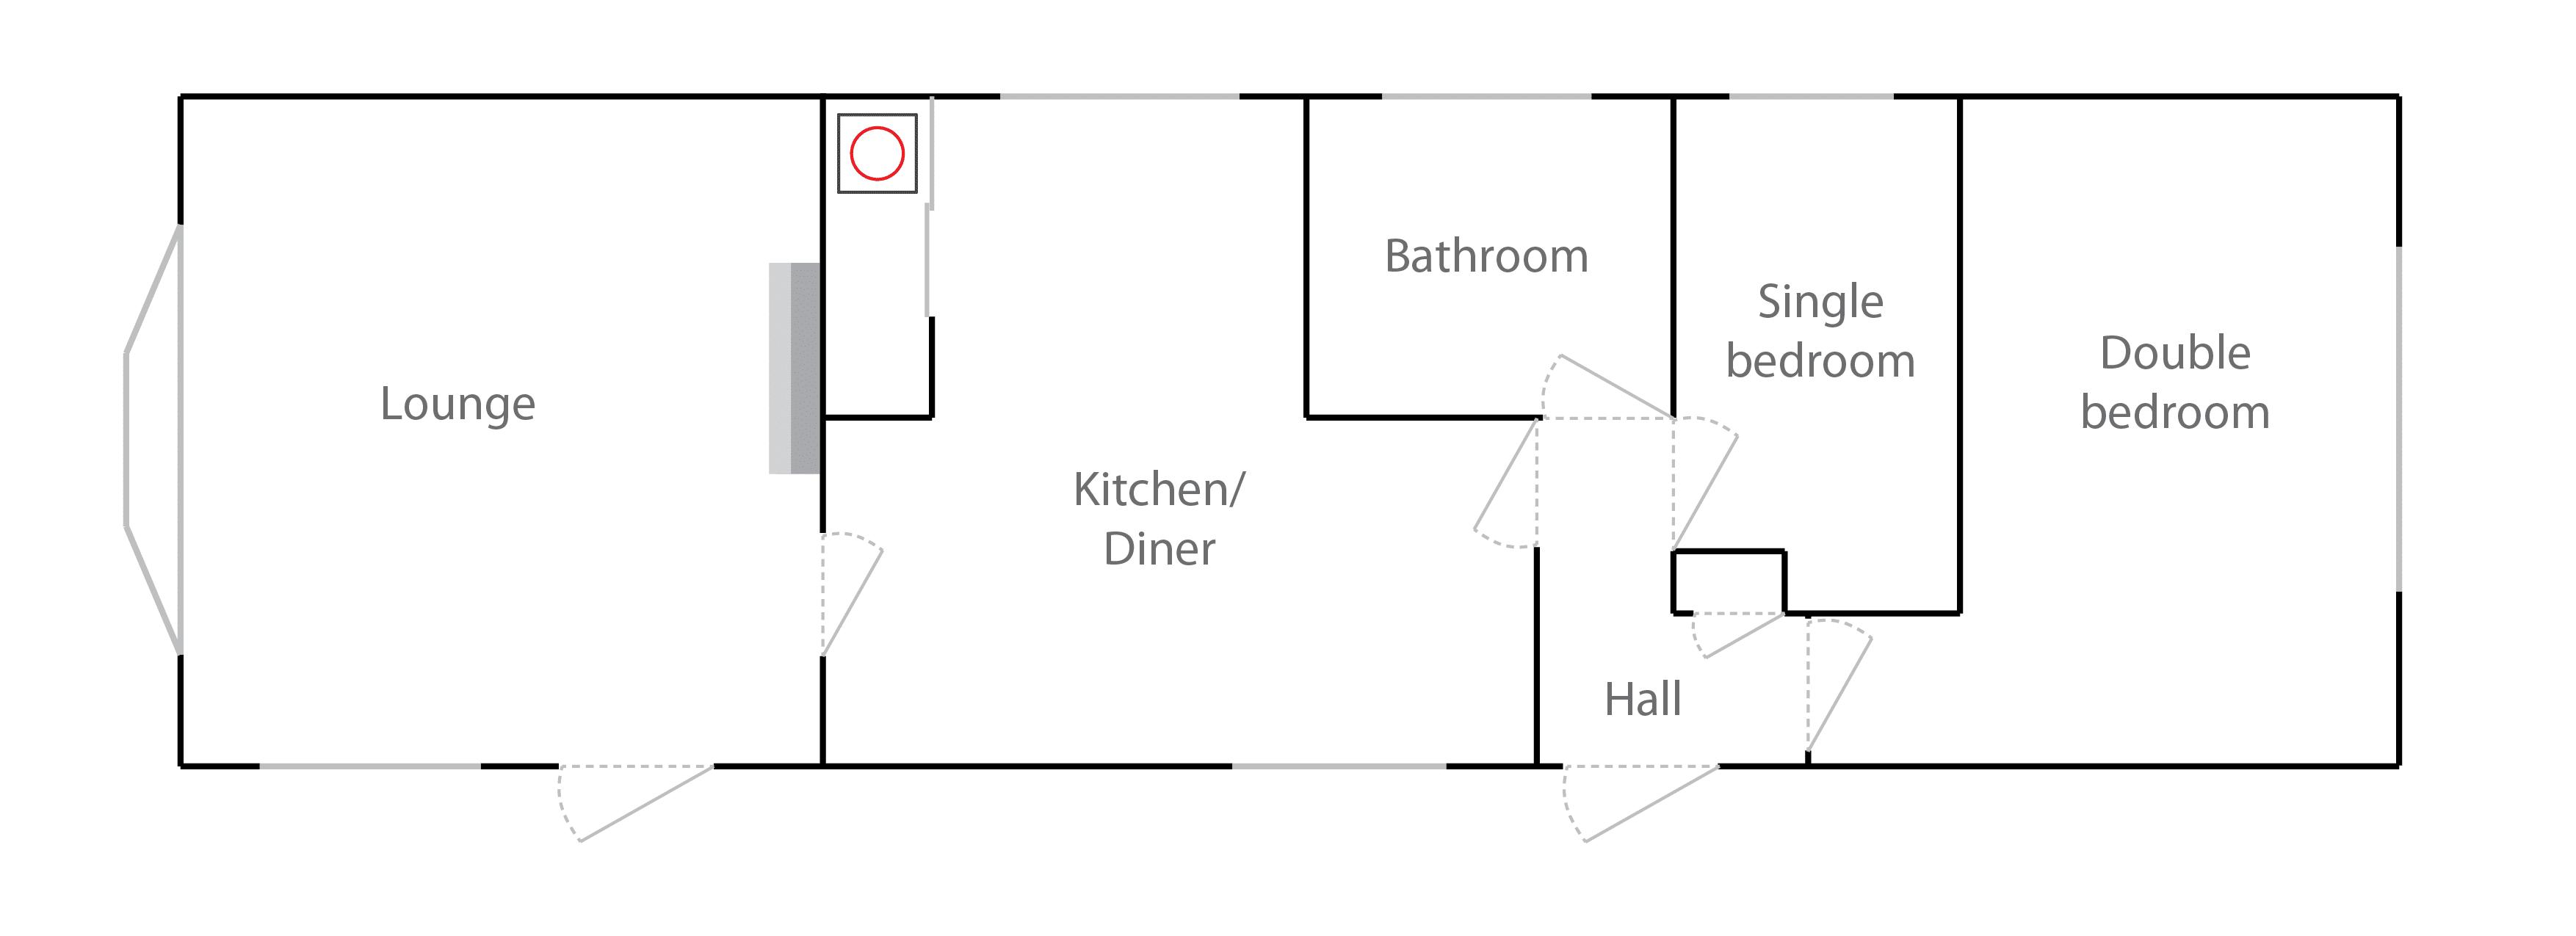 Floorplan for 17 Merrywood Park Box Hill Surrey